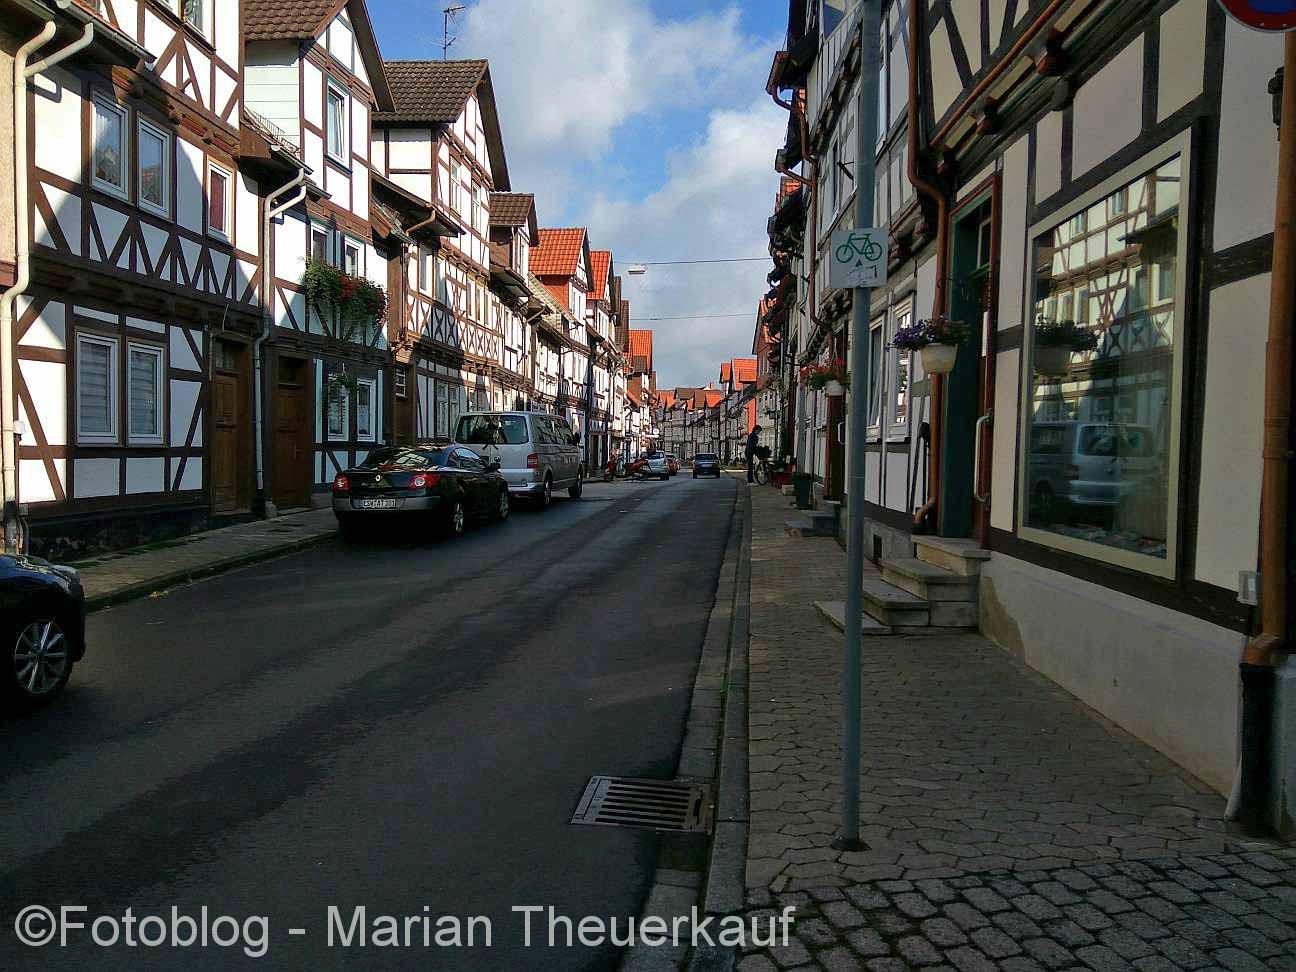 Radtour | Tanjas Fotoblog